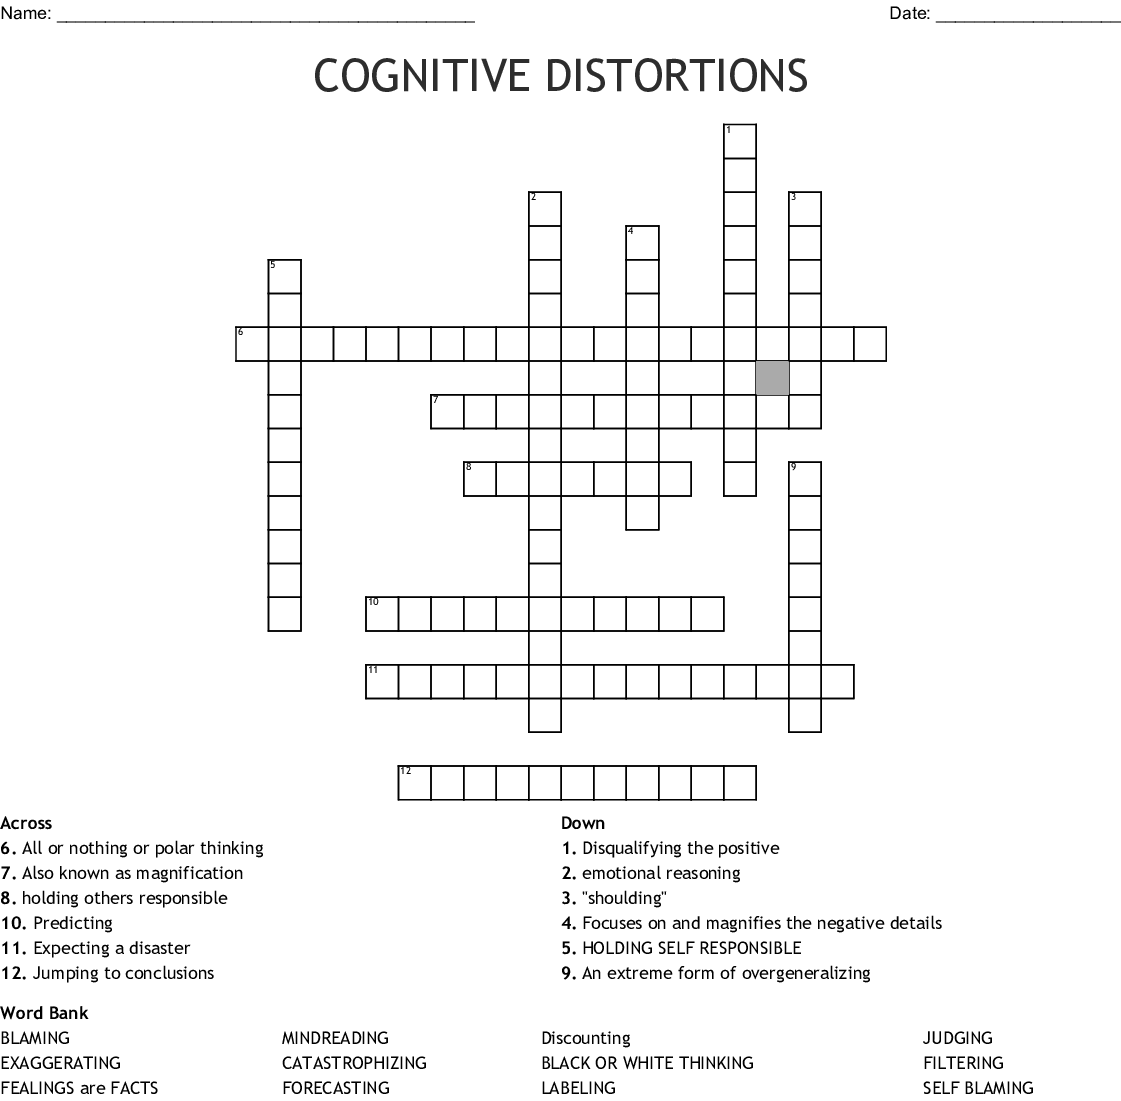 Cognitive Distortion Bingo